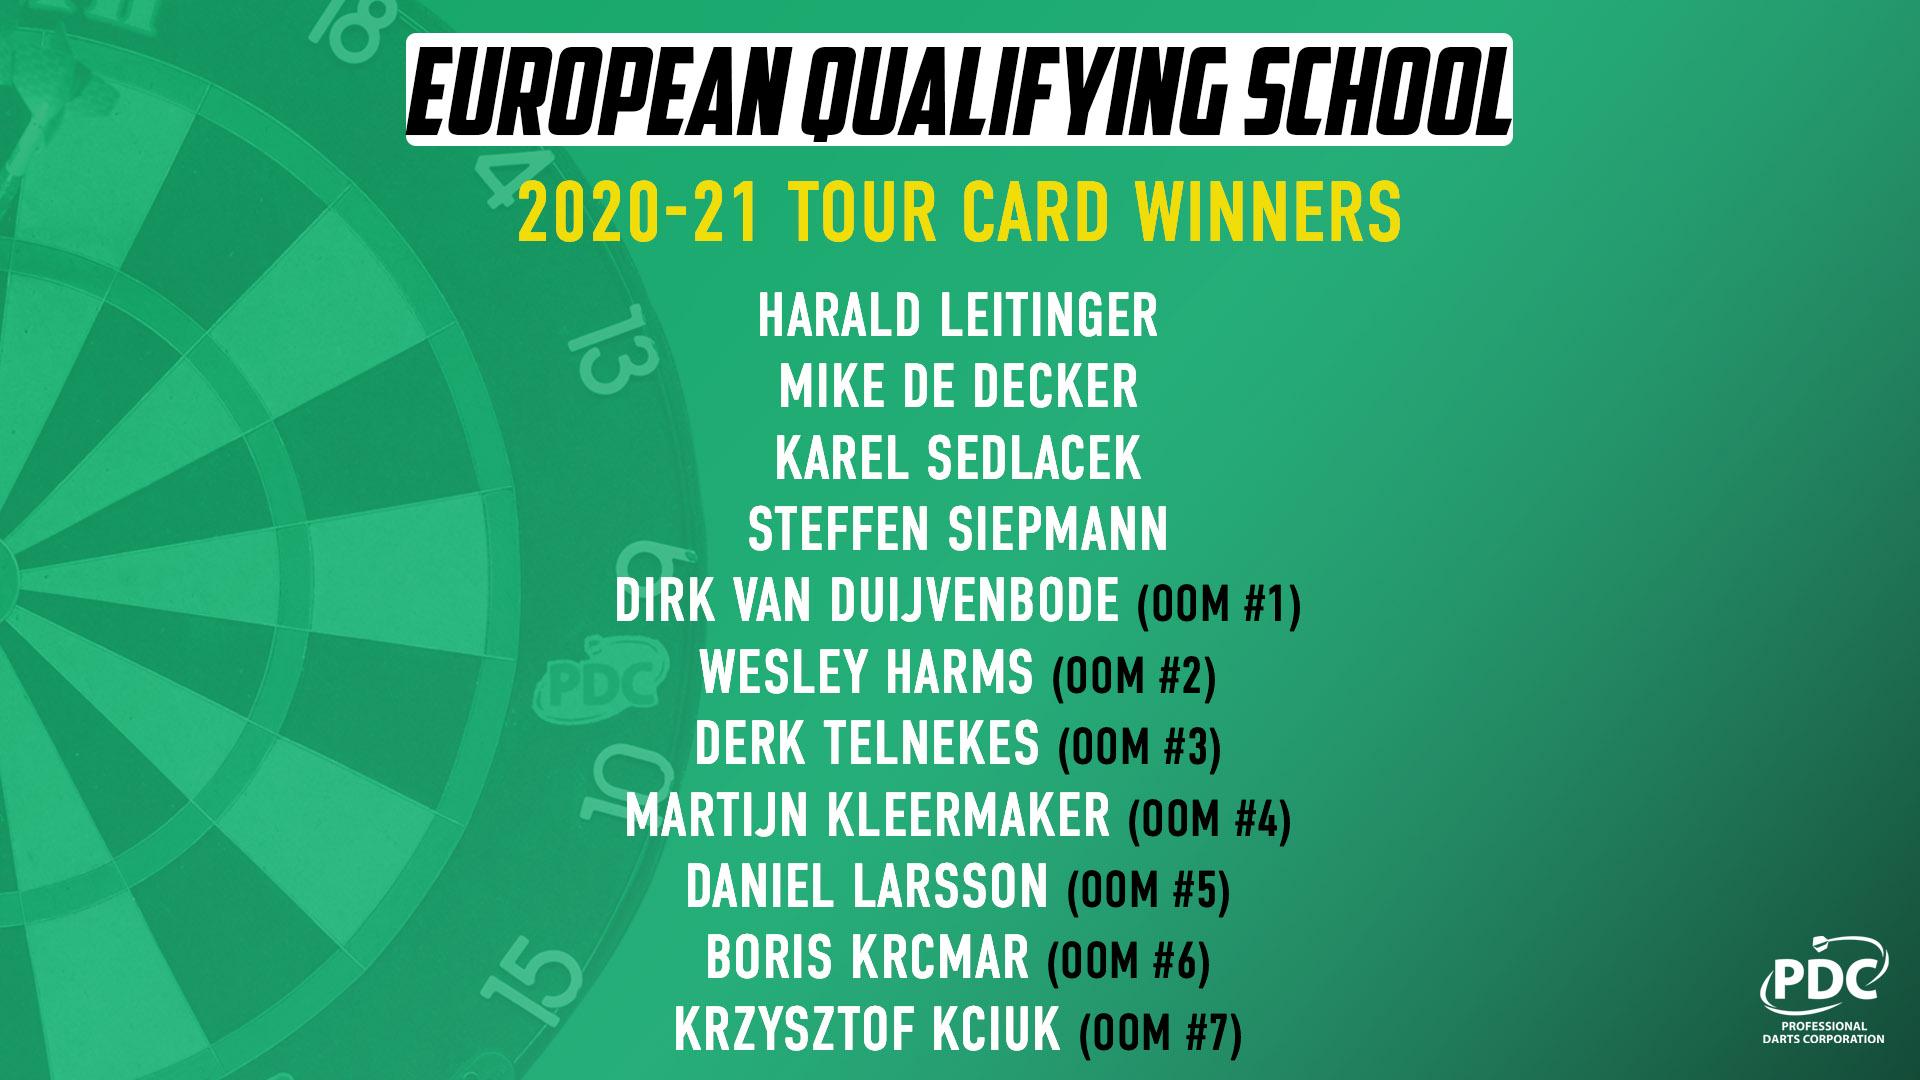 European Q School winners (PDC)